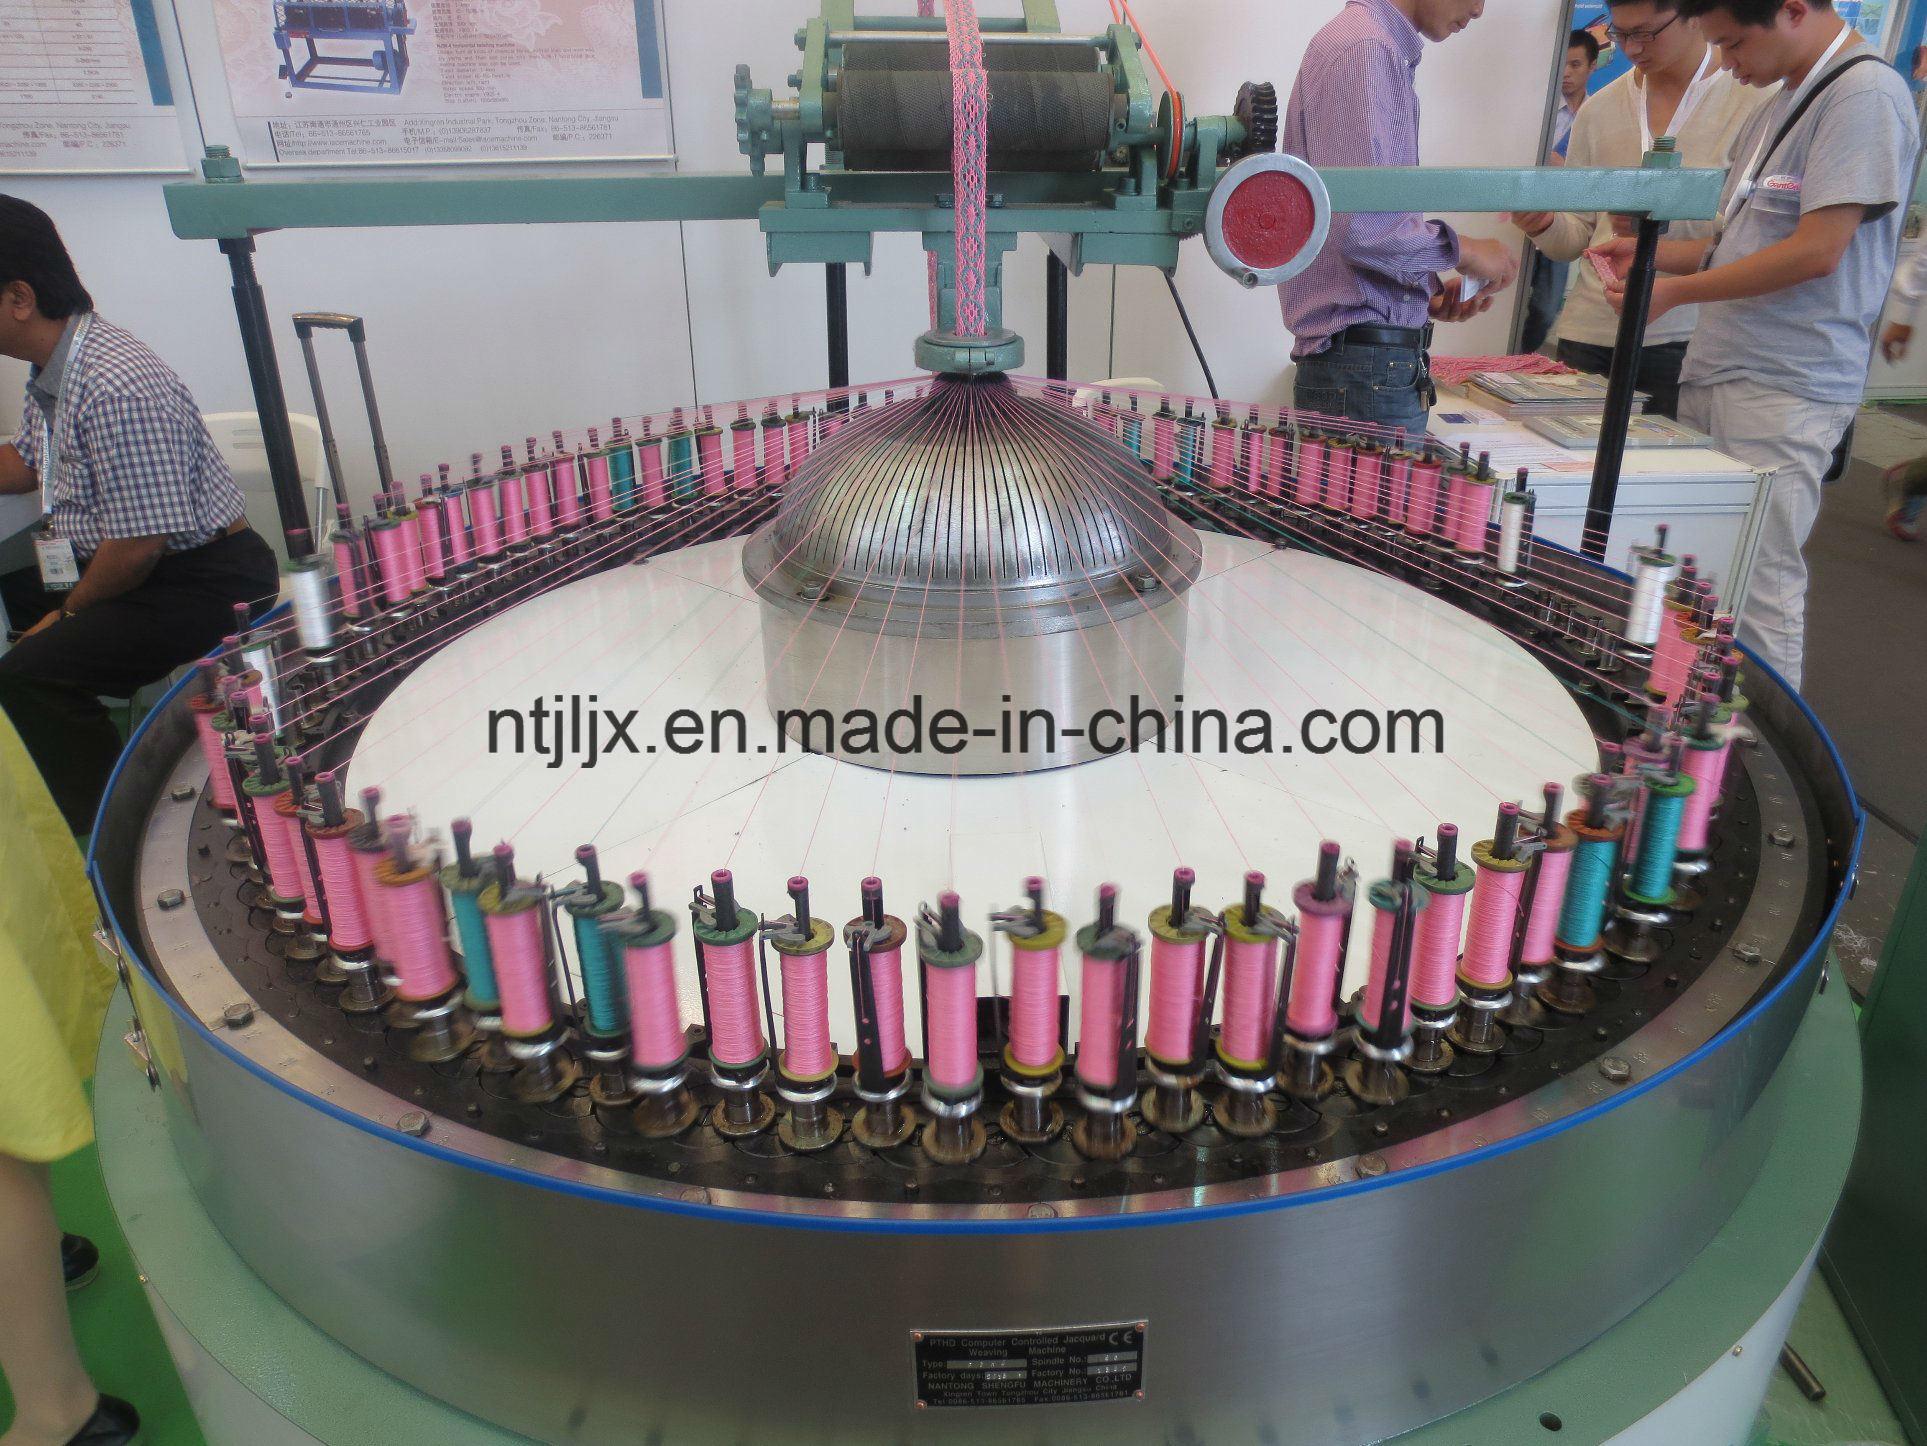 Pthd-96 Computerized Lace Braiding Machine